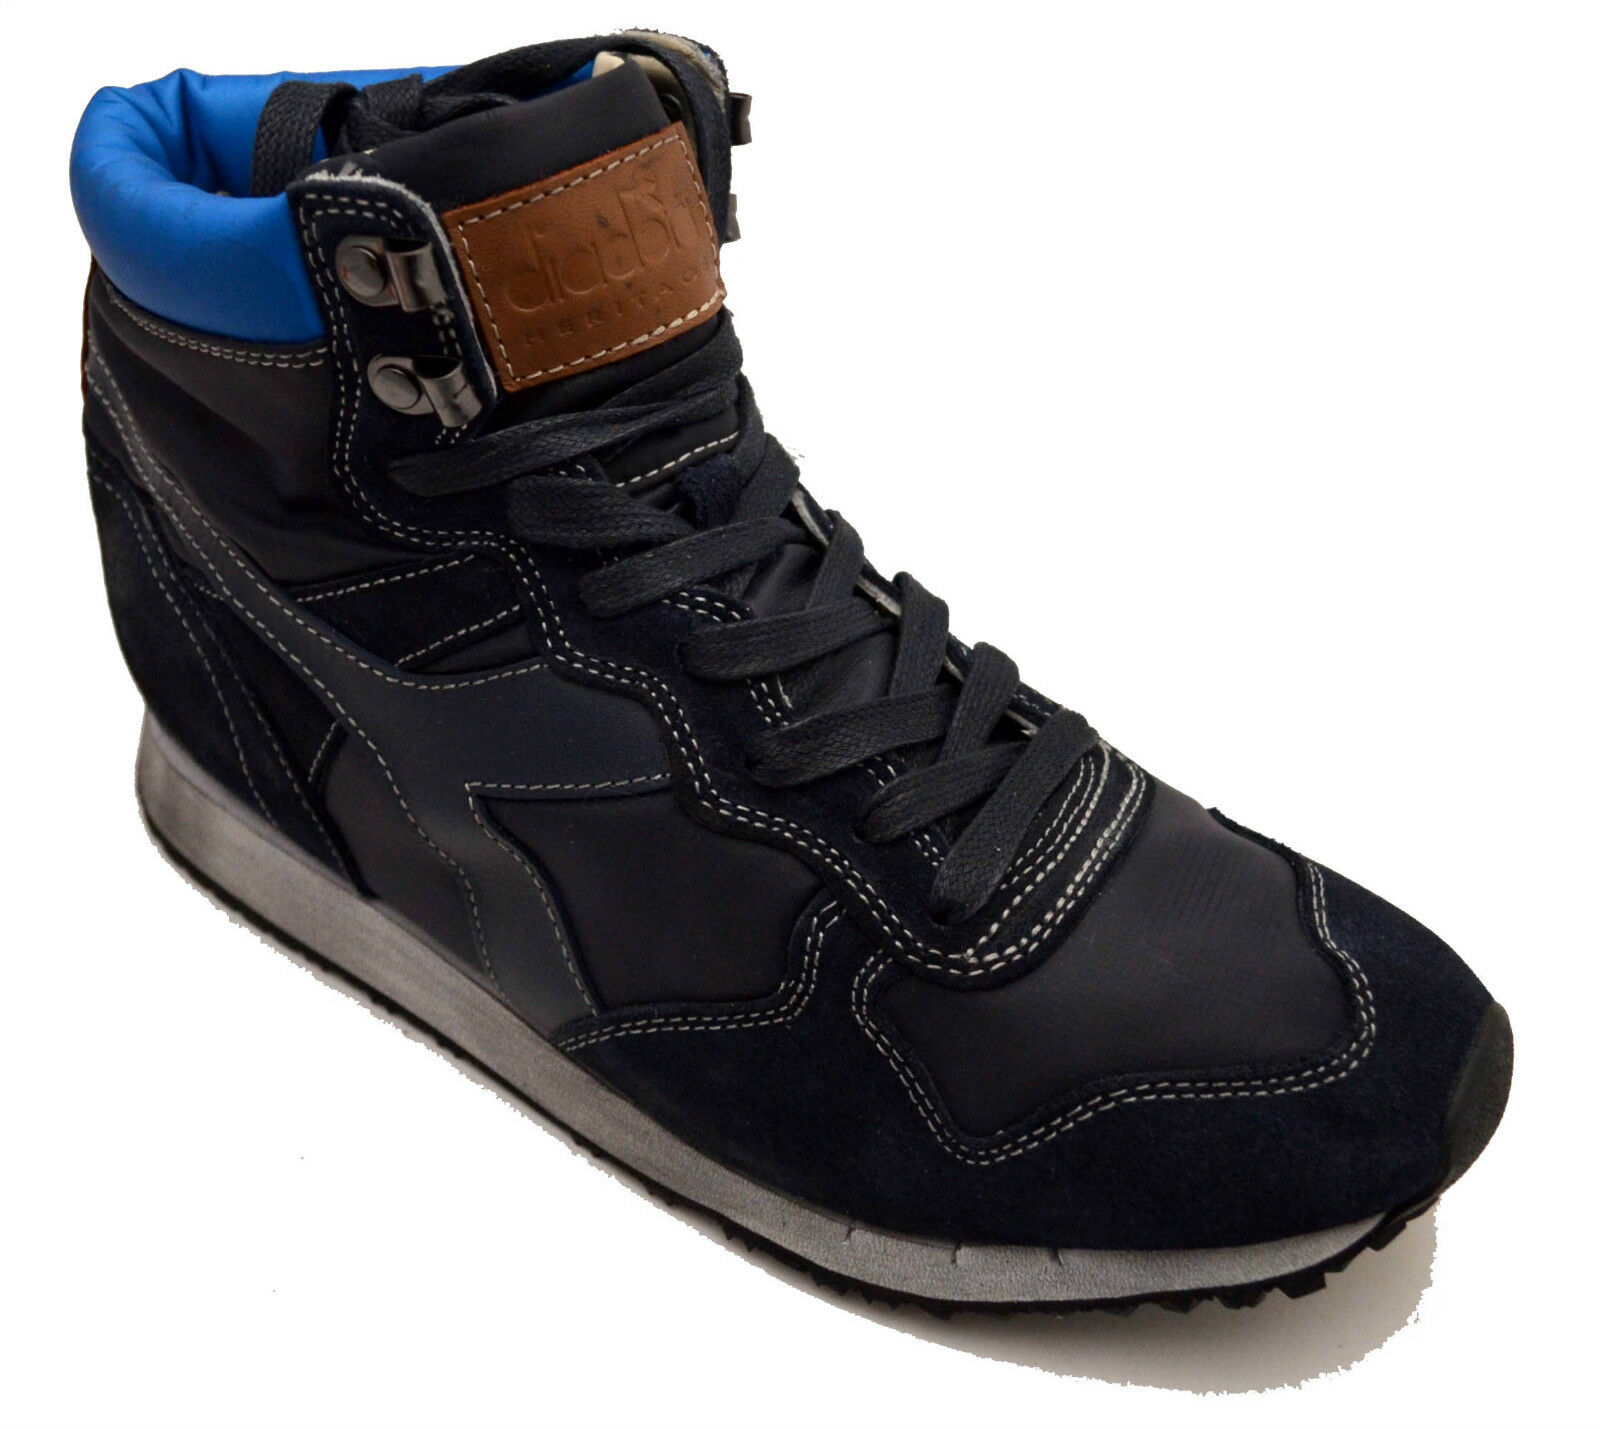 Diadora Heritage scarpe scarpe da ginnastica Pelle Vintage shoes 159225 Uomo Uomo Donna Donna 159225 shoes ba29a1